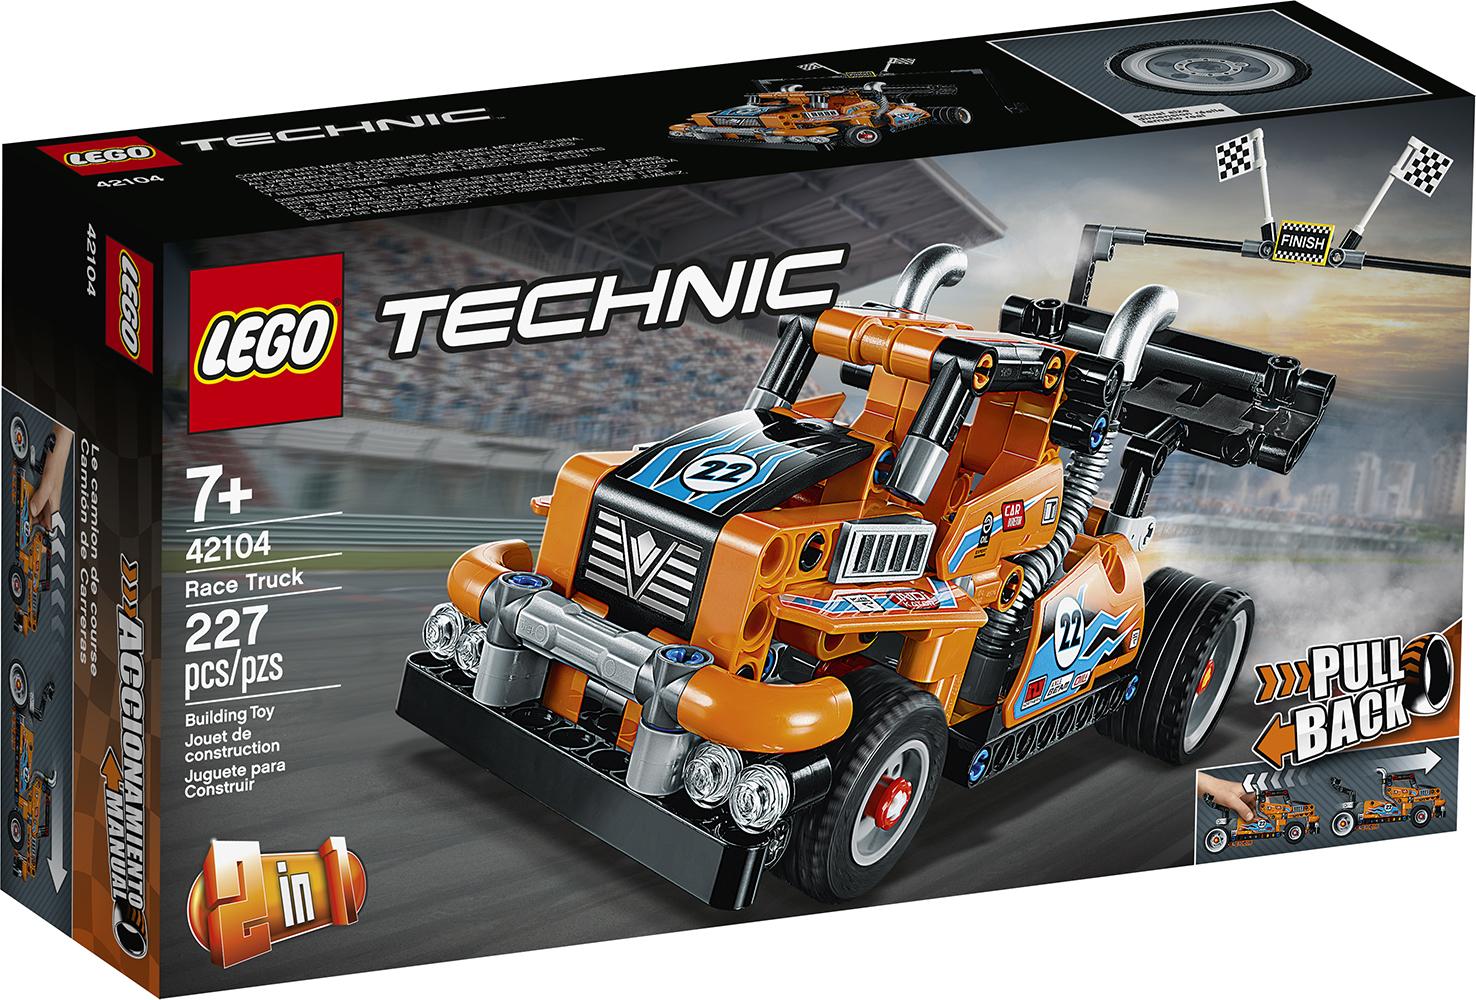 Technic -Race Truck